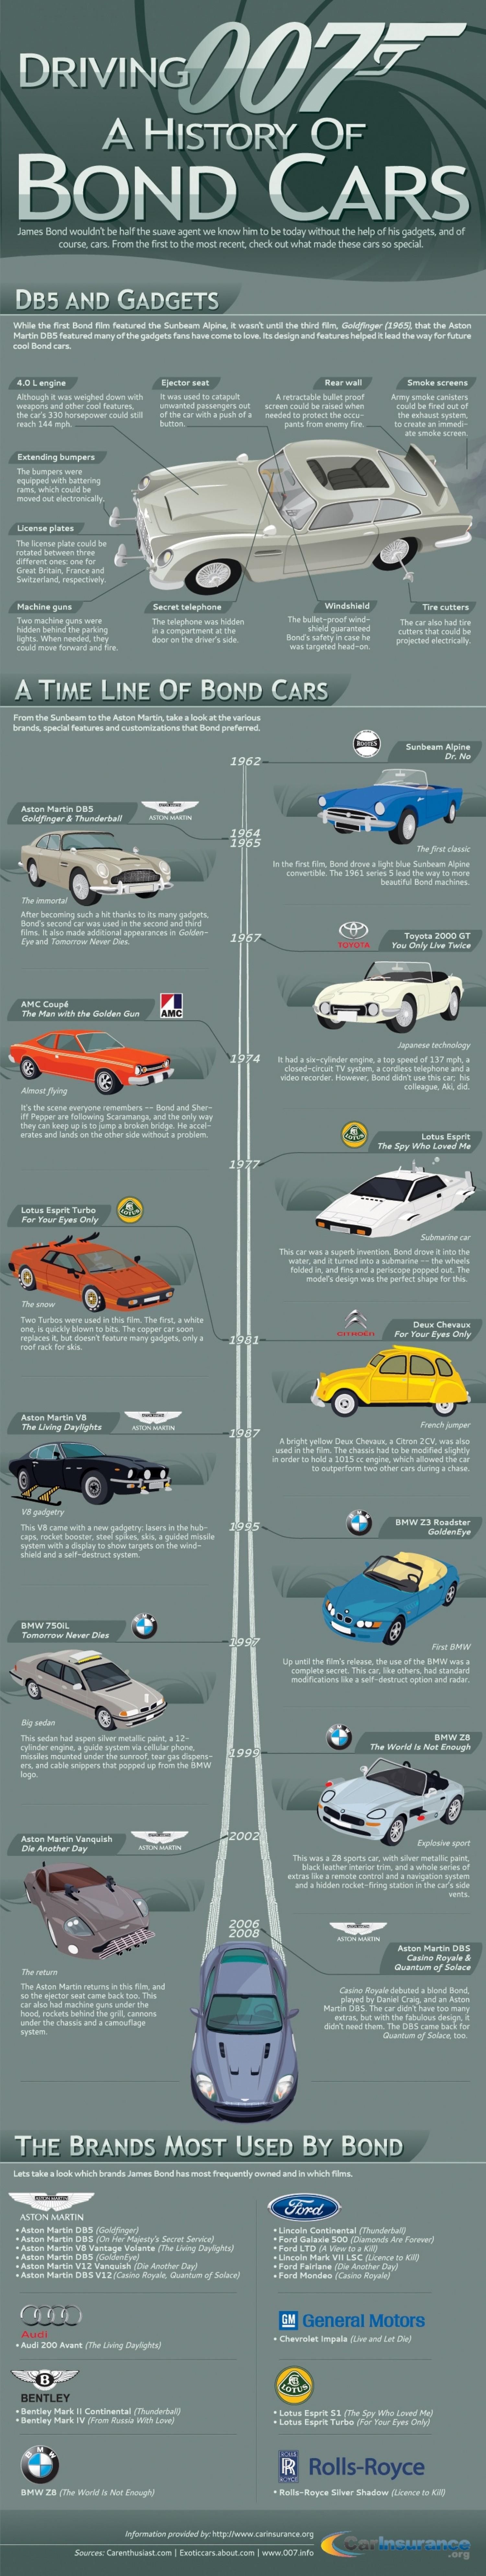 infographie-voiture-james-bond